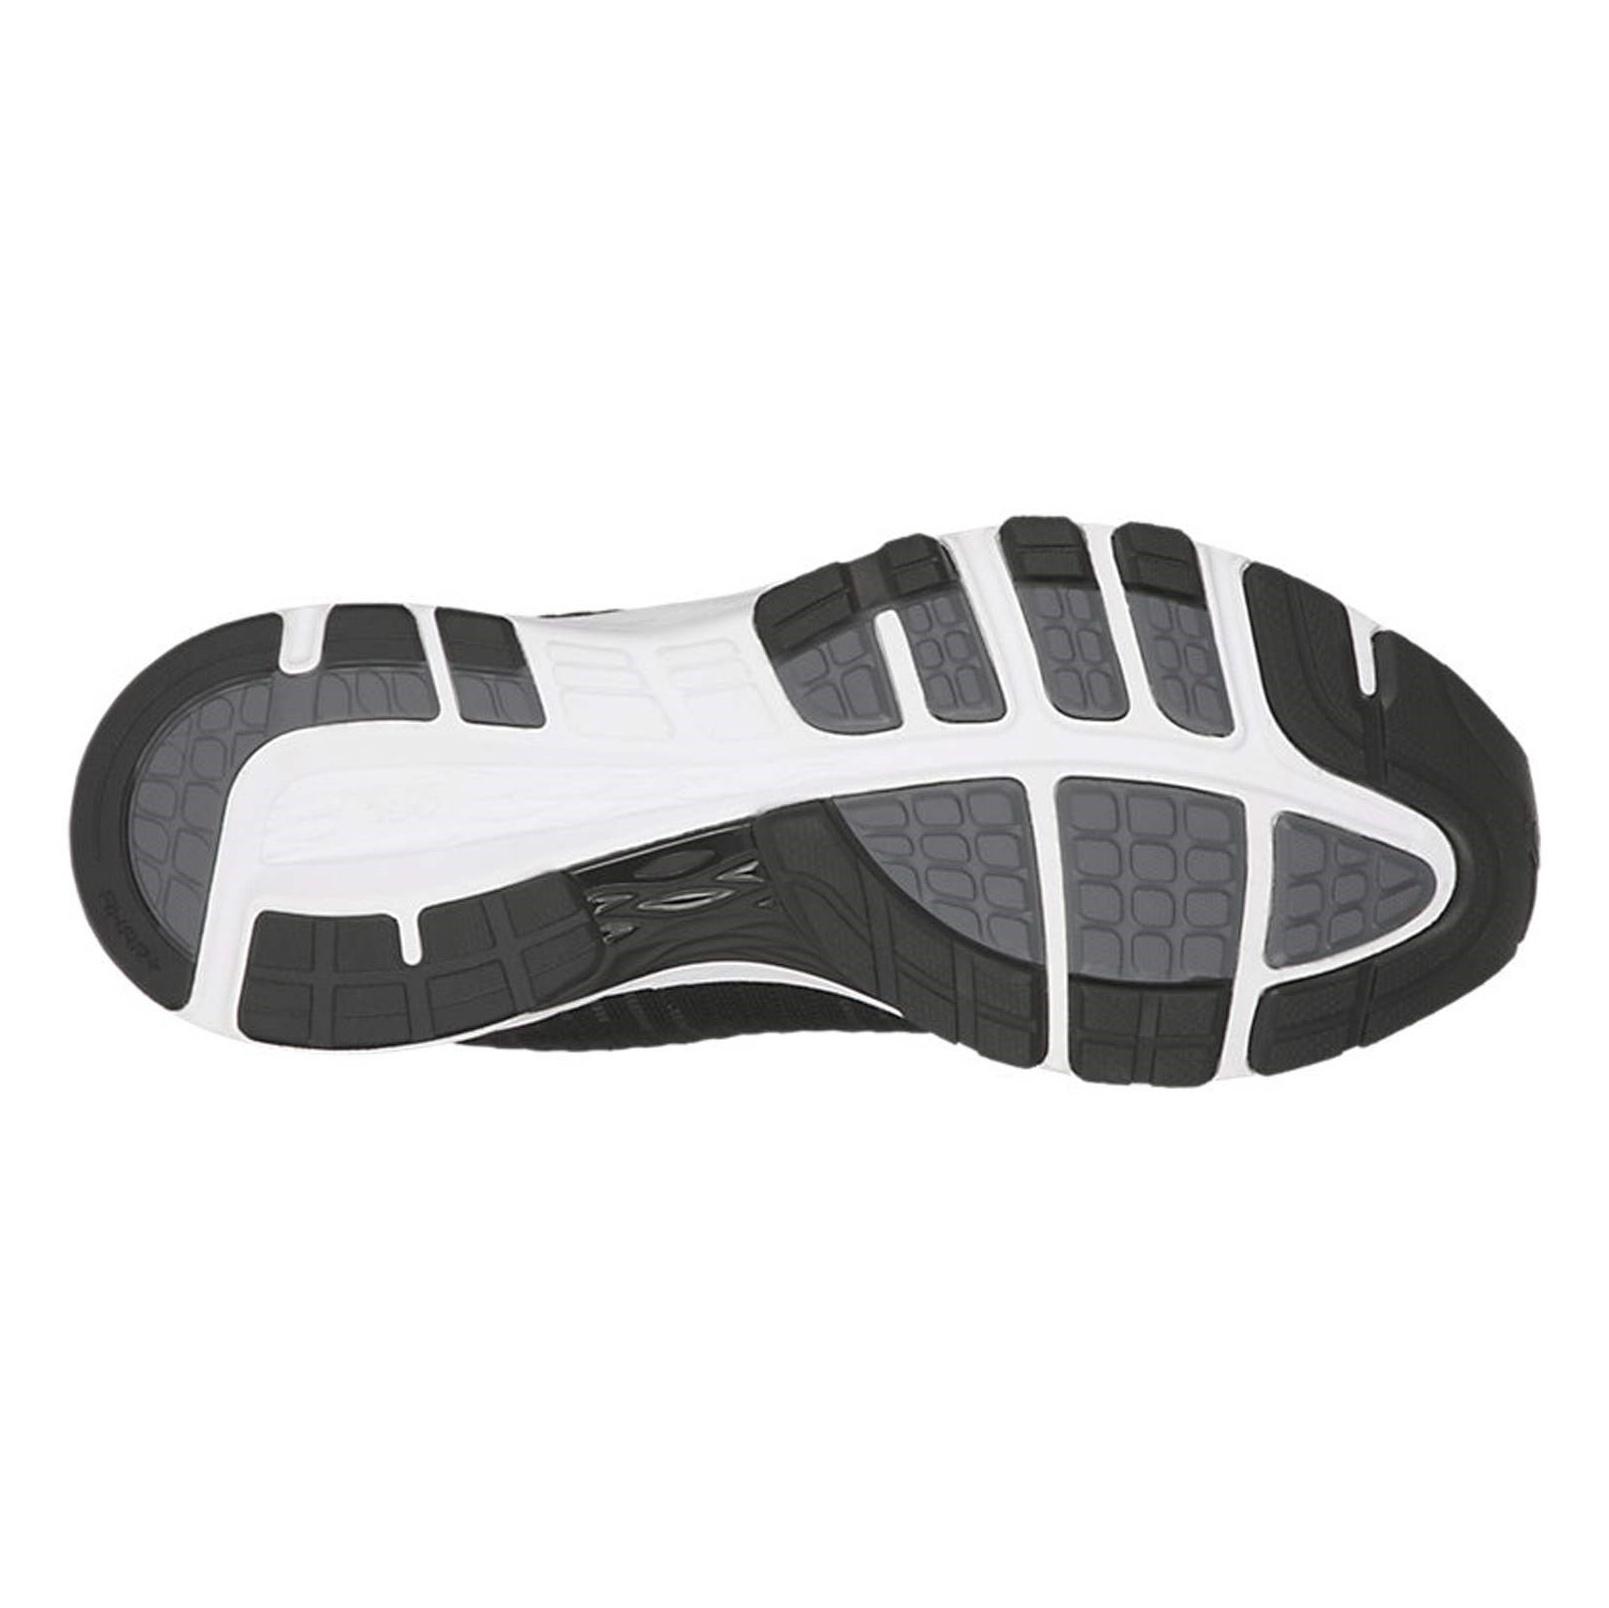 کفش دویدن بندی زنانه DynaFlyte 2 -  - مشکی - 3